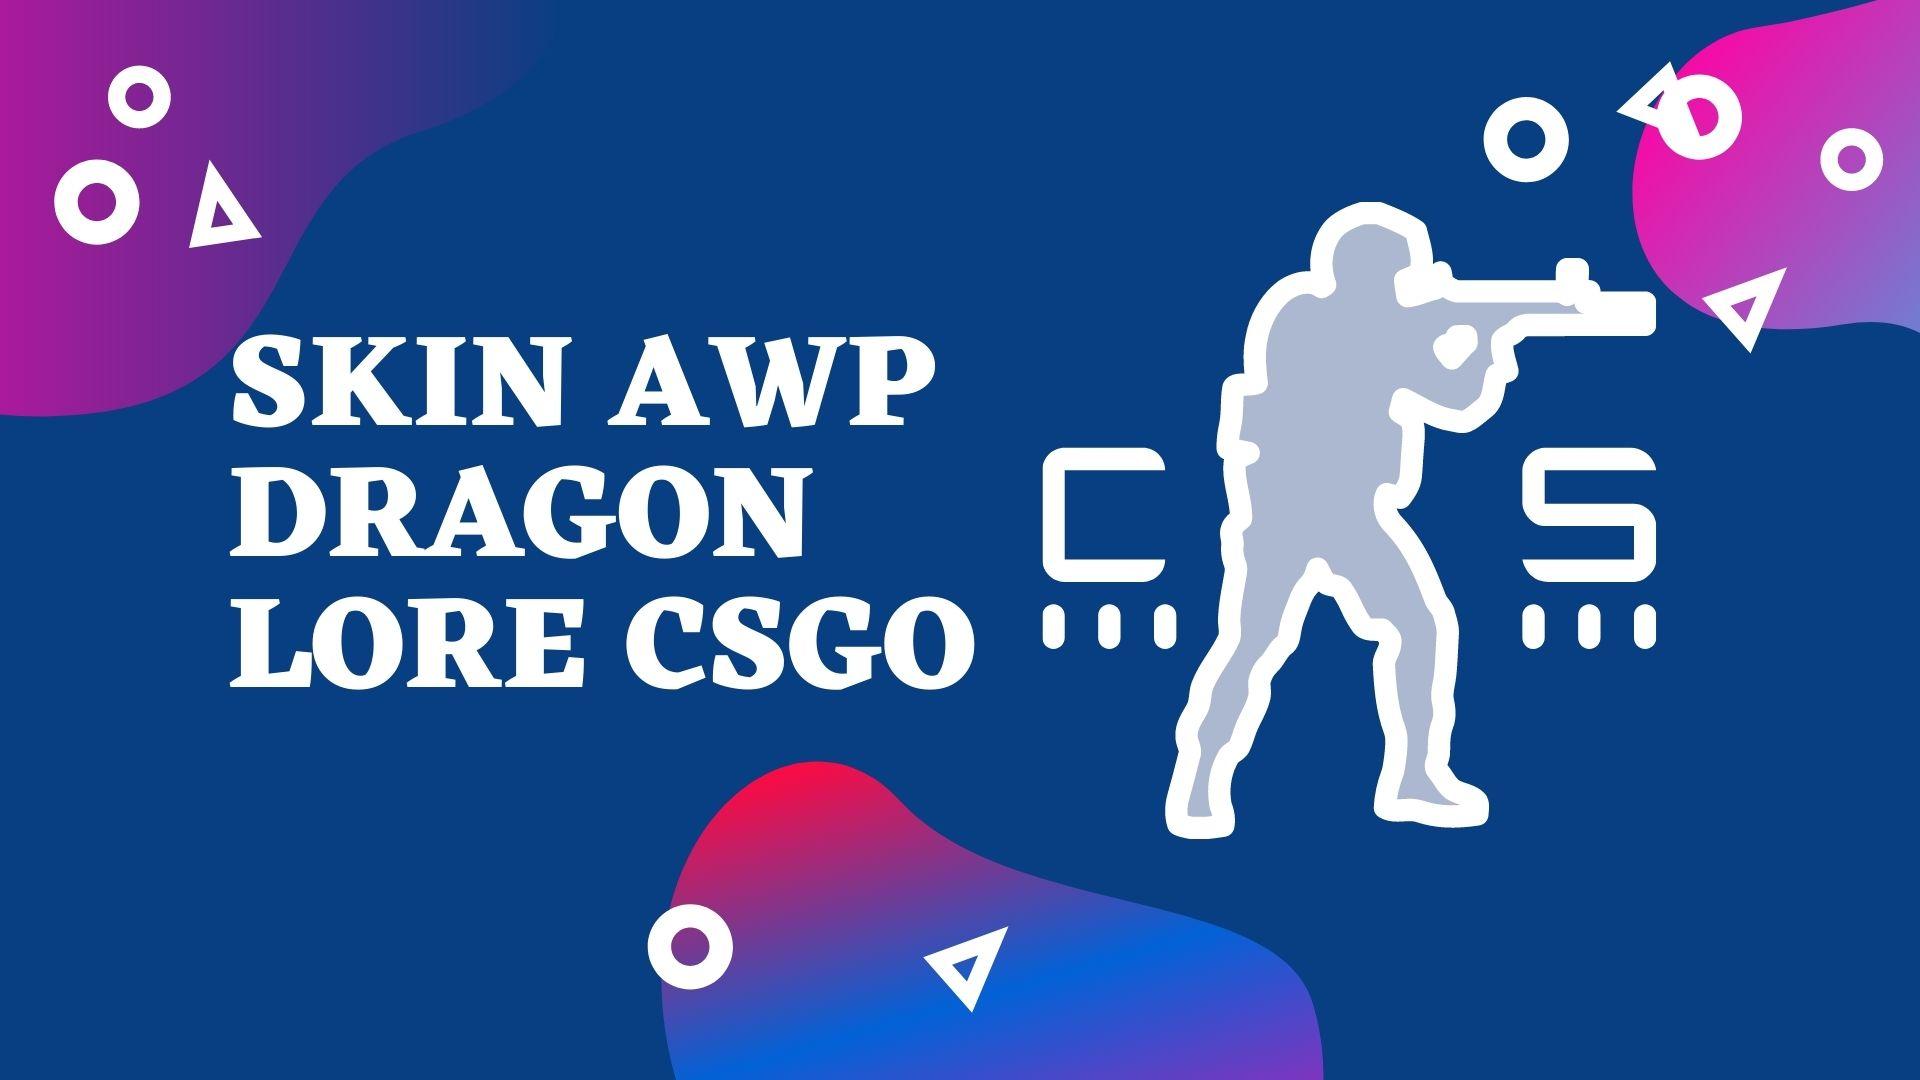 Harga Skin AWP Dragon Lore CSGO, Woouw !